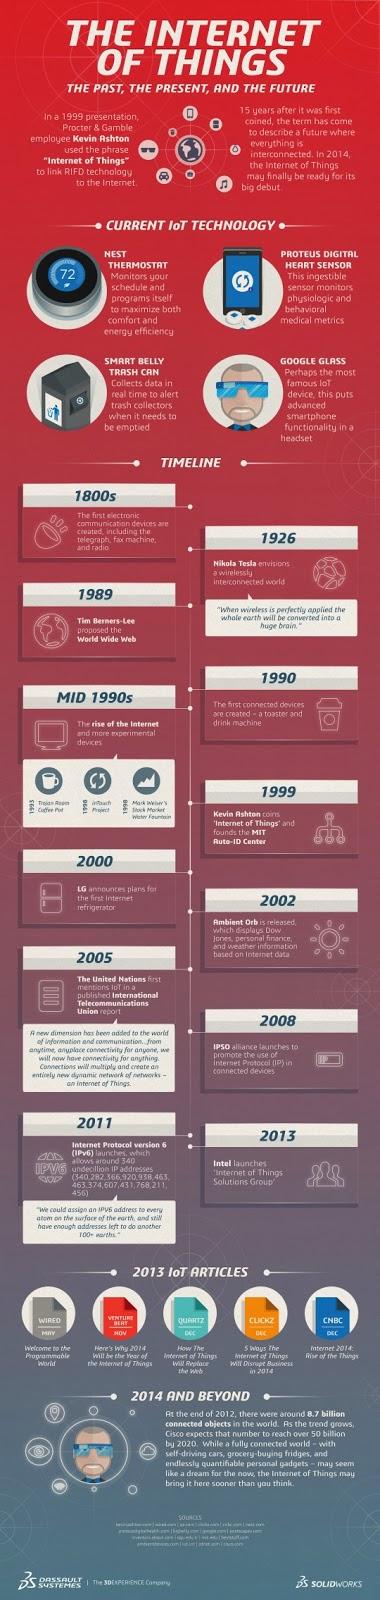 http://www.grahamjones.co.uk/2014/multimedia/infographics/history-internet-things.html